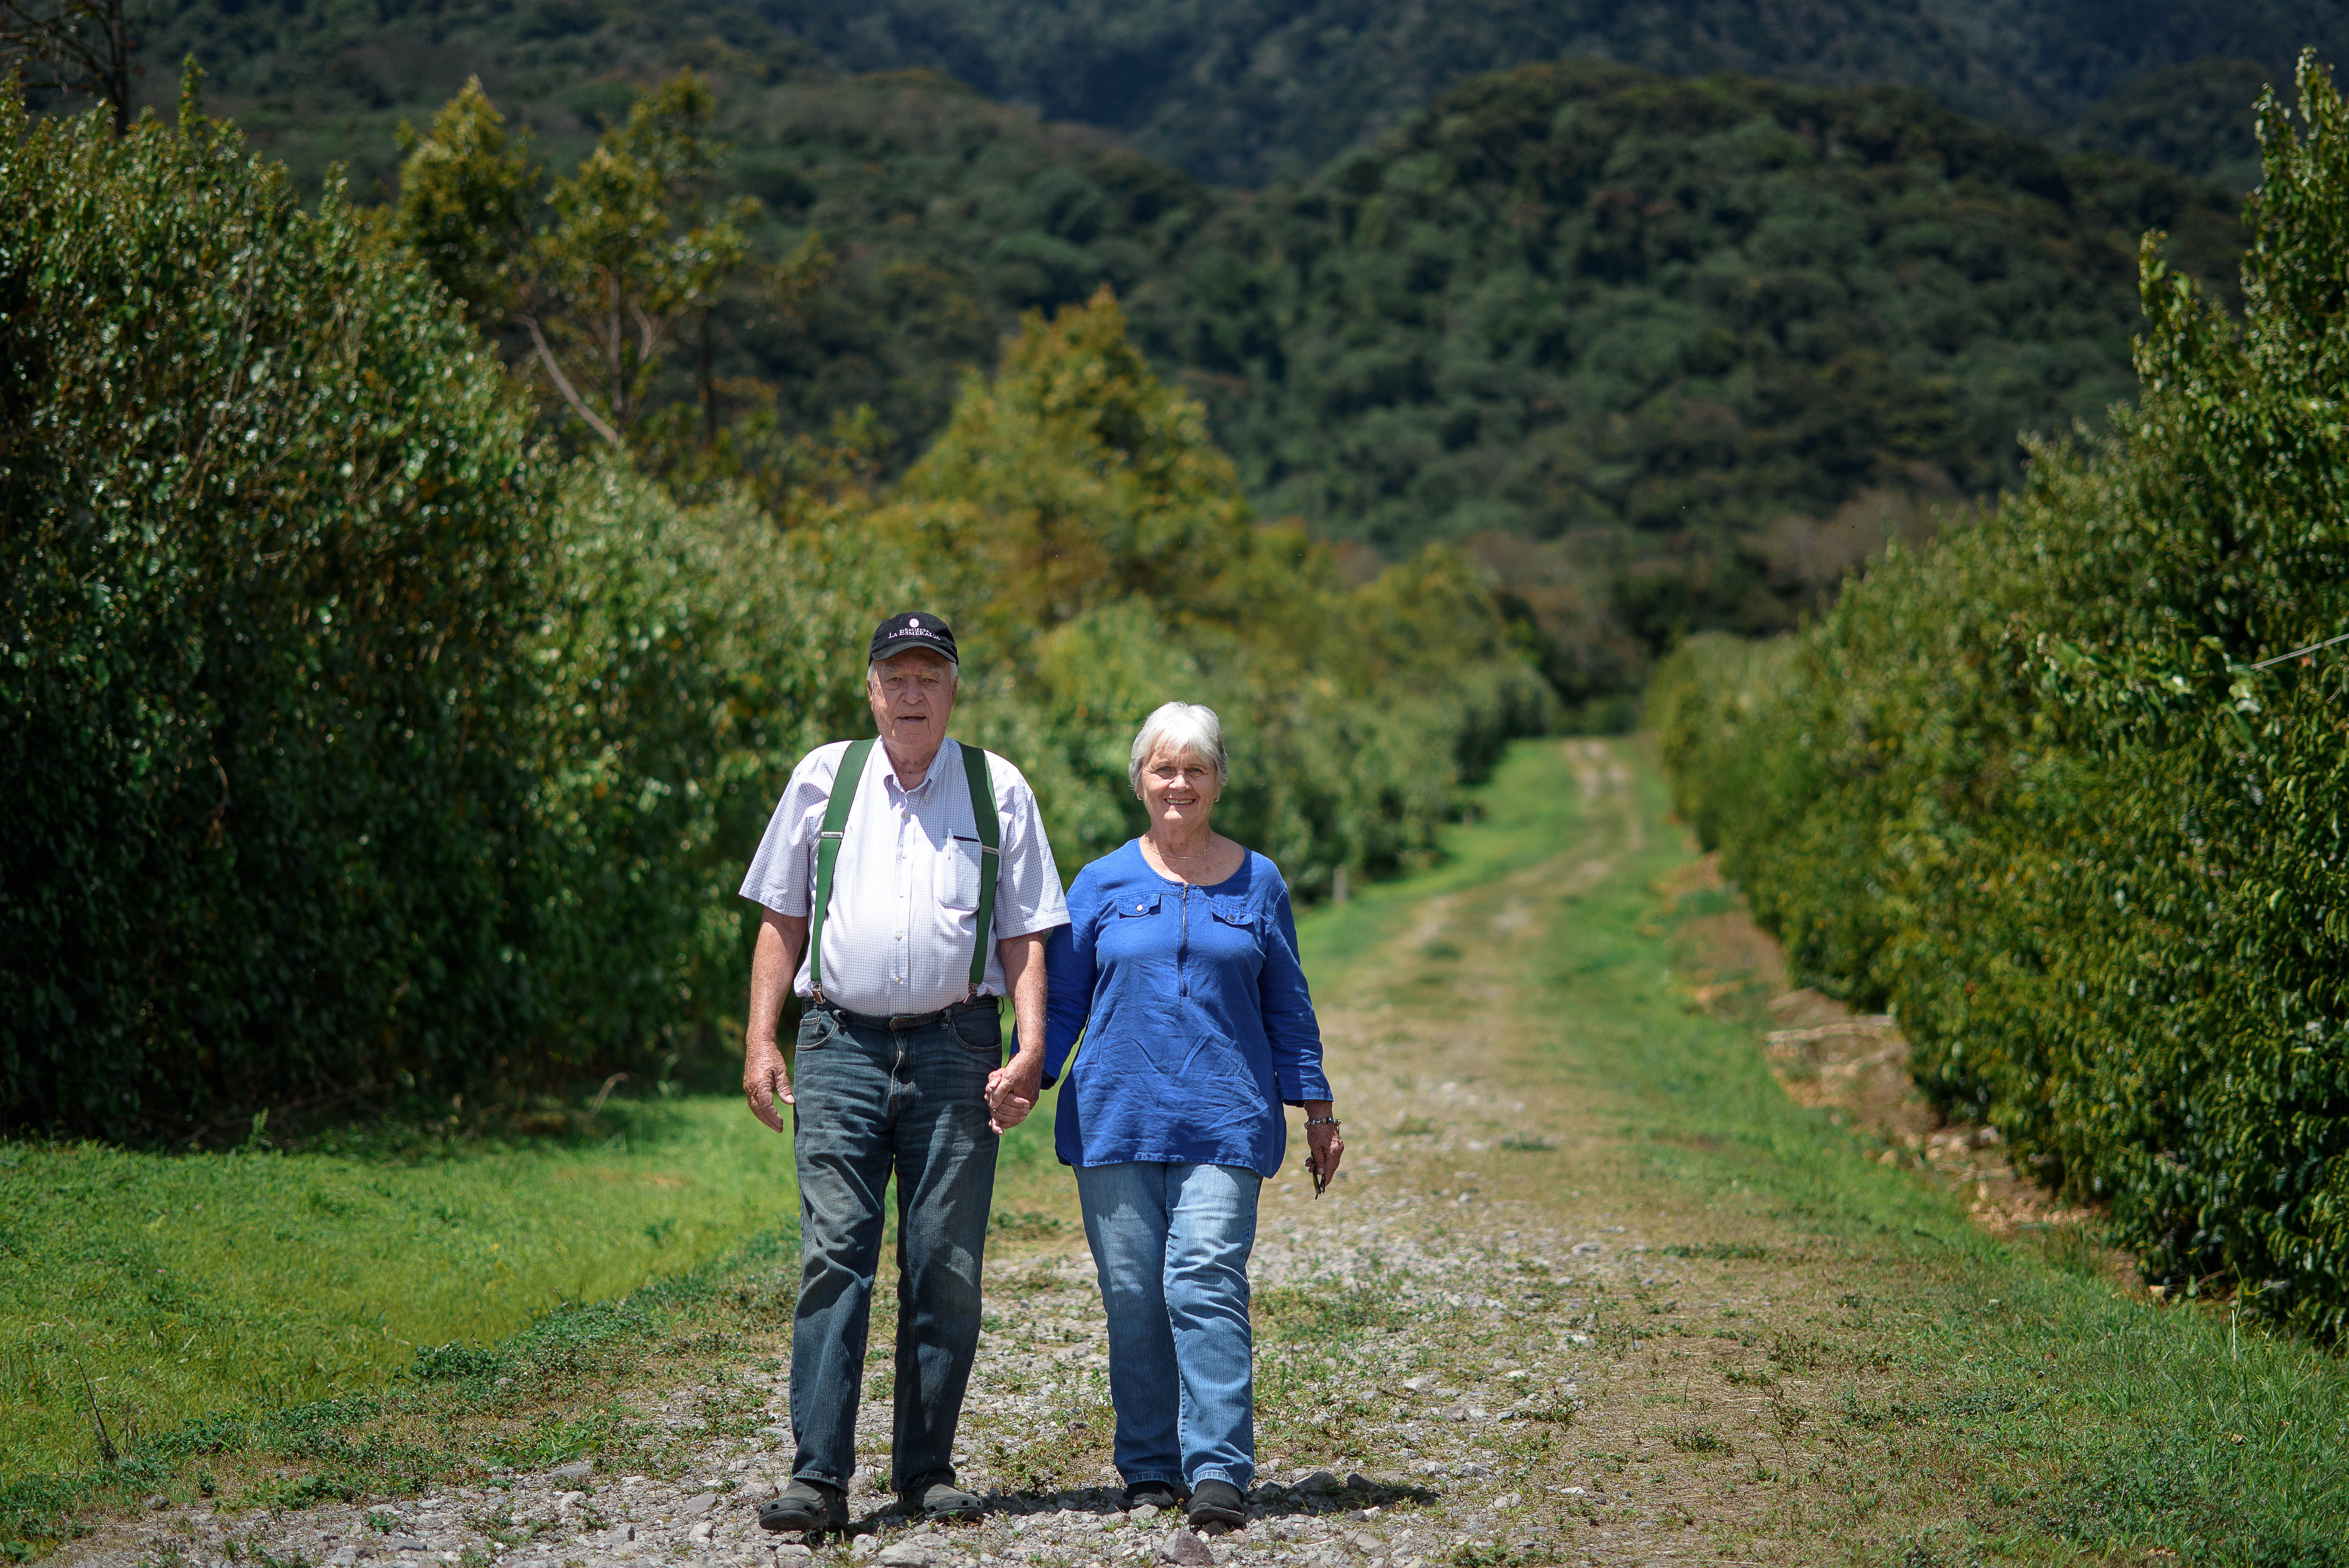 Price og Susan Peterson ejer Esmeralda farmen